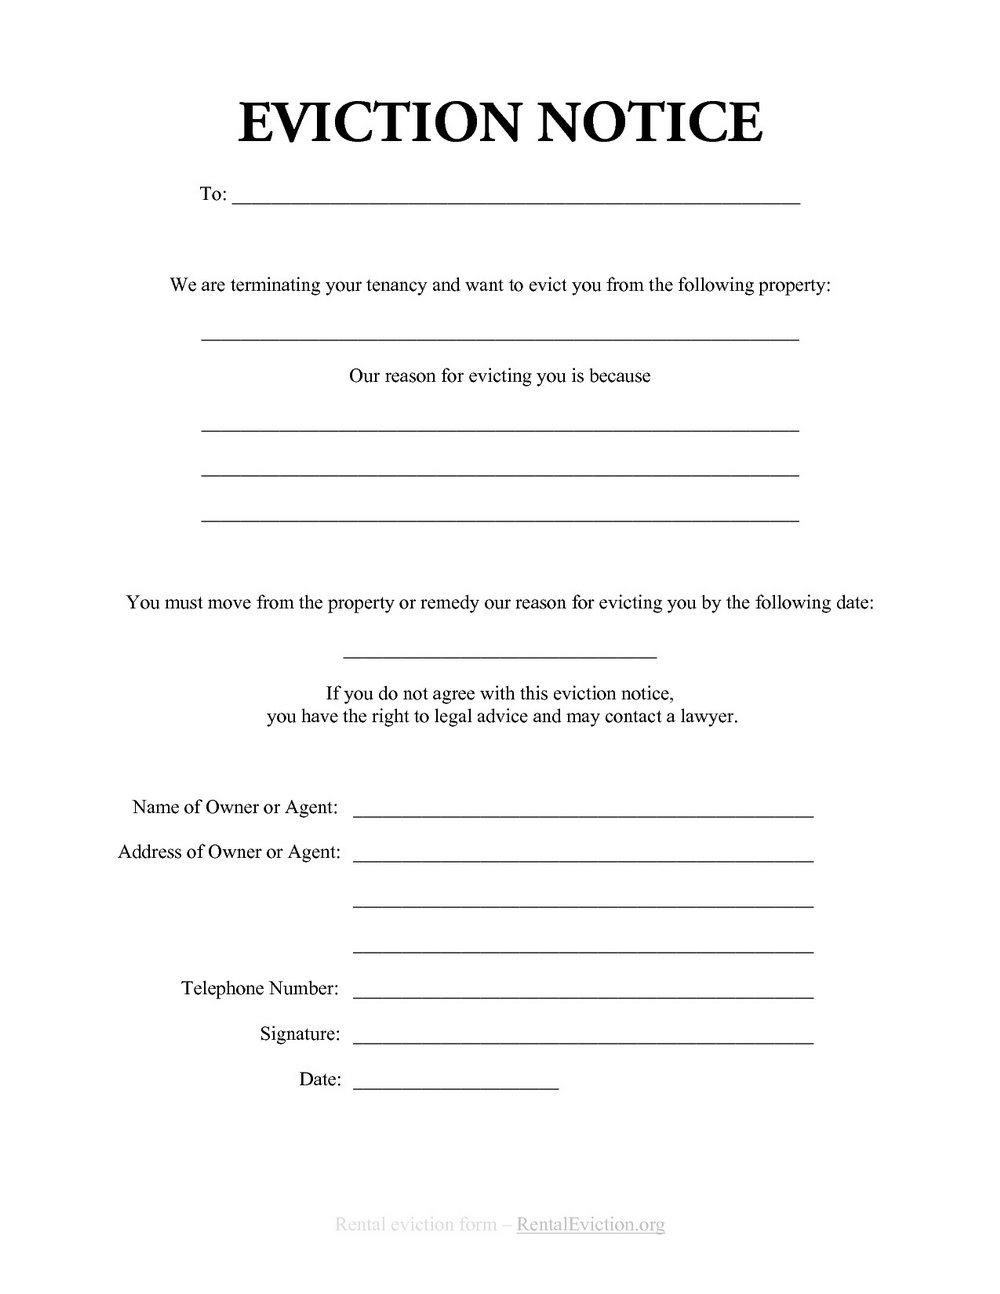 Rental Eviction Notice Form